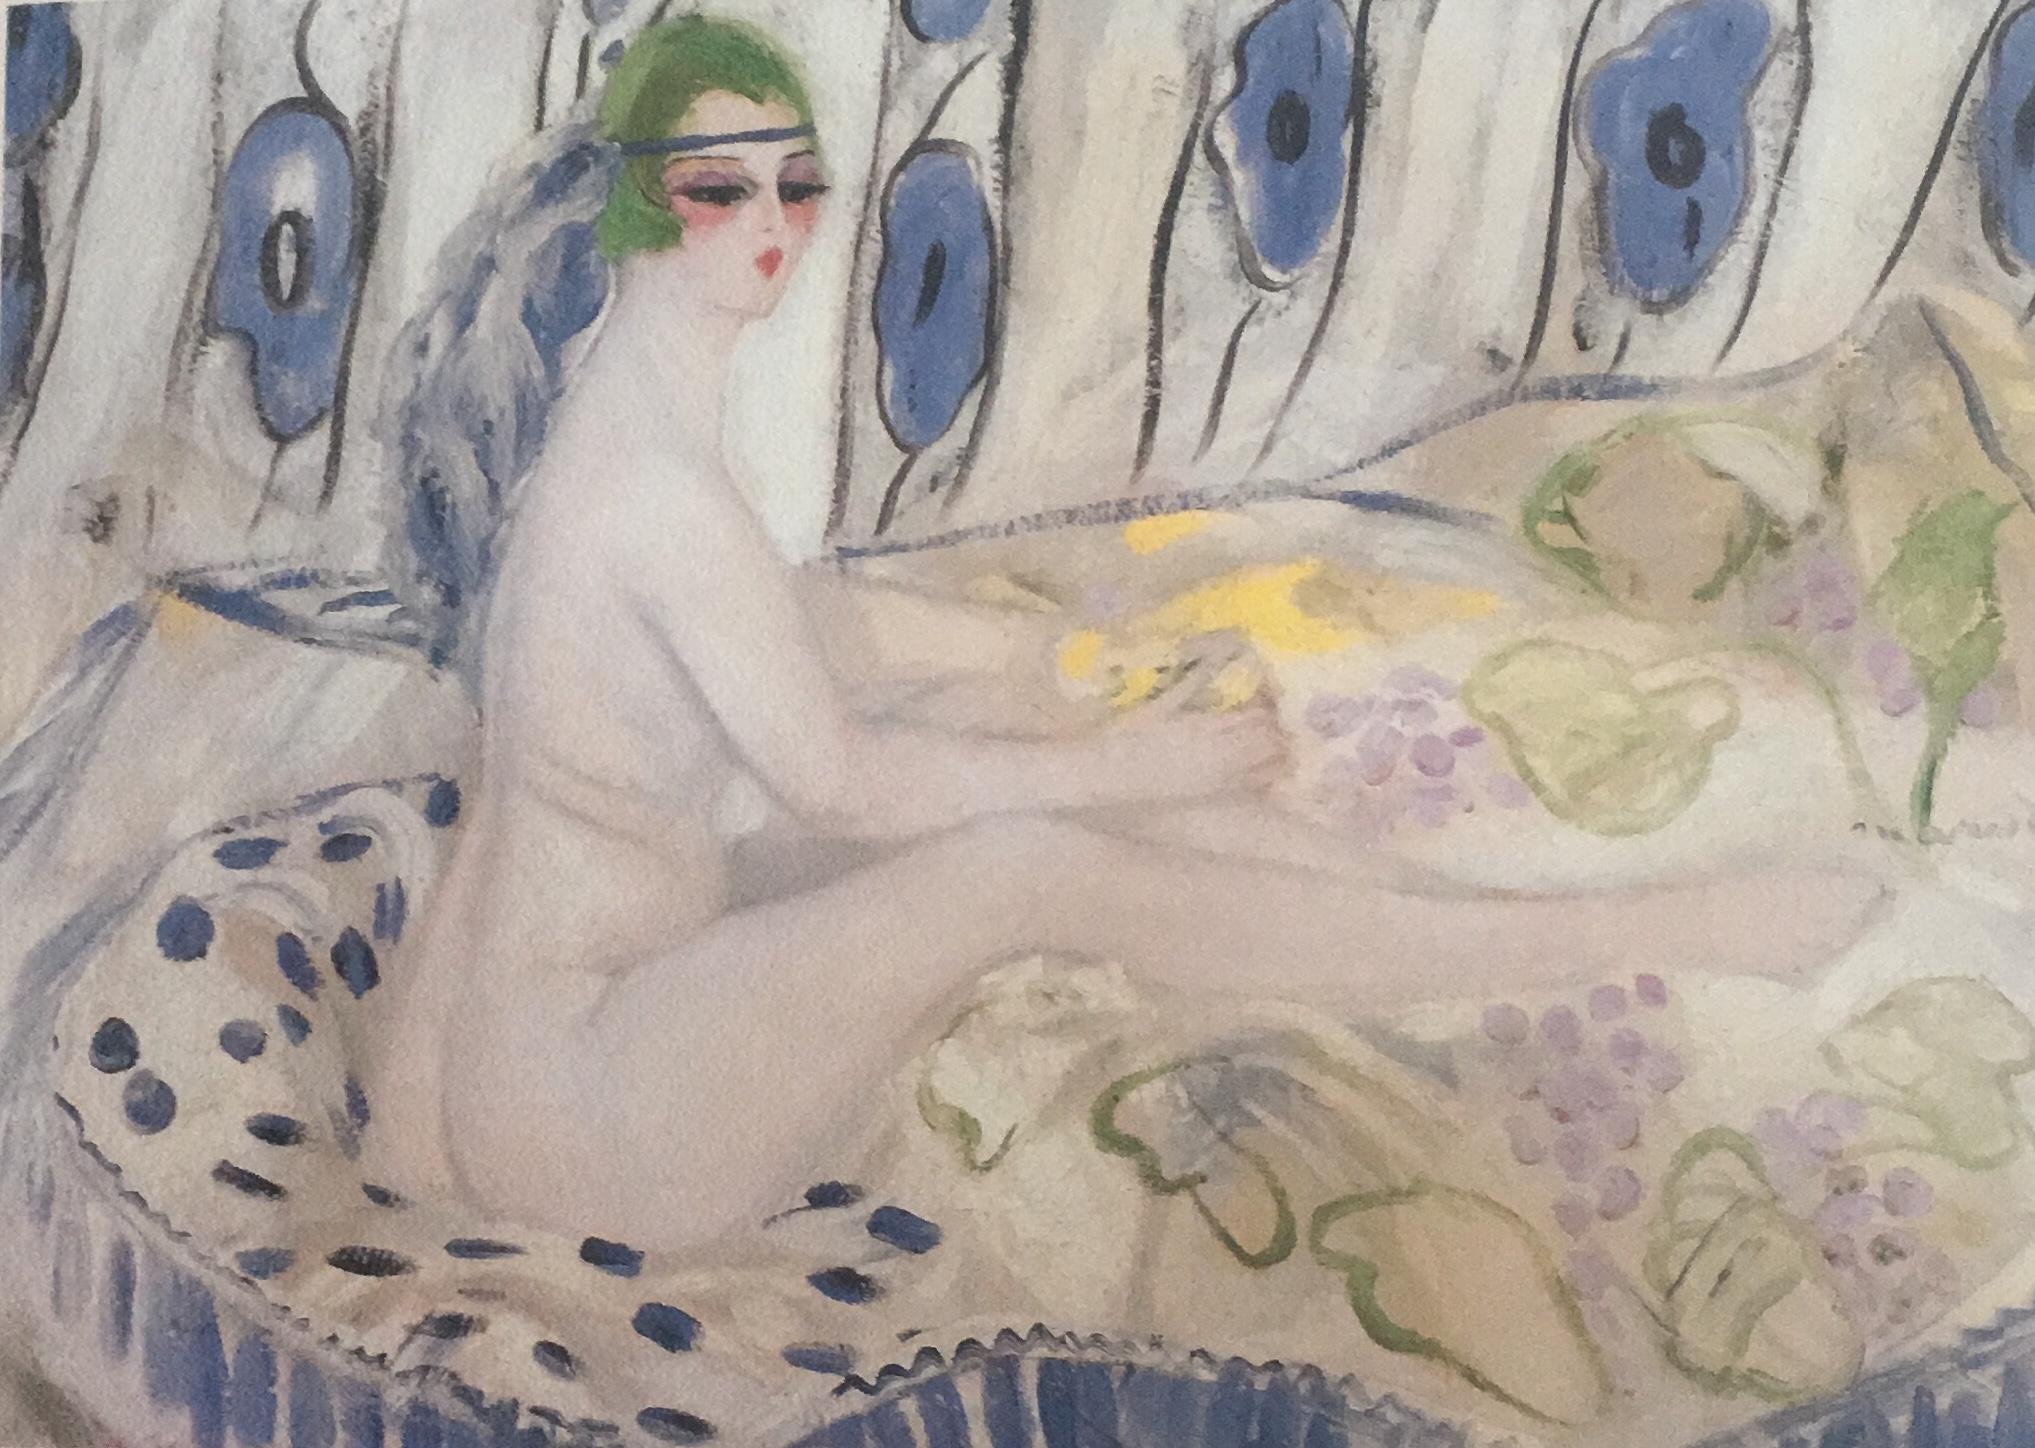 La Petite Cléopâtre, Jacqueline Marval, 1920. Huile sur toile, 0,995 m x 1, 37 m. Ohara Museum of Art, Kurashiki, Japon.